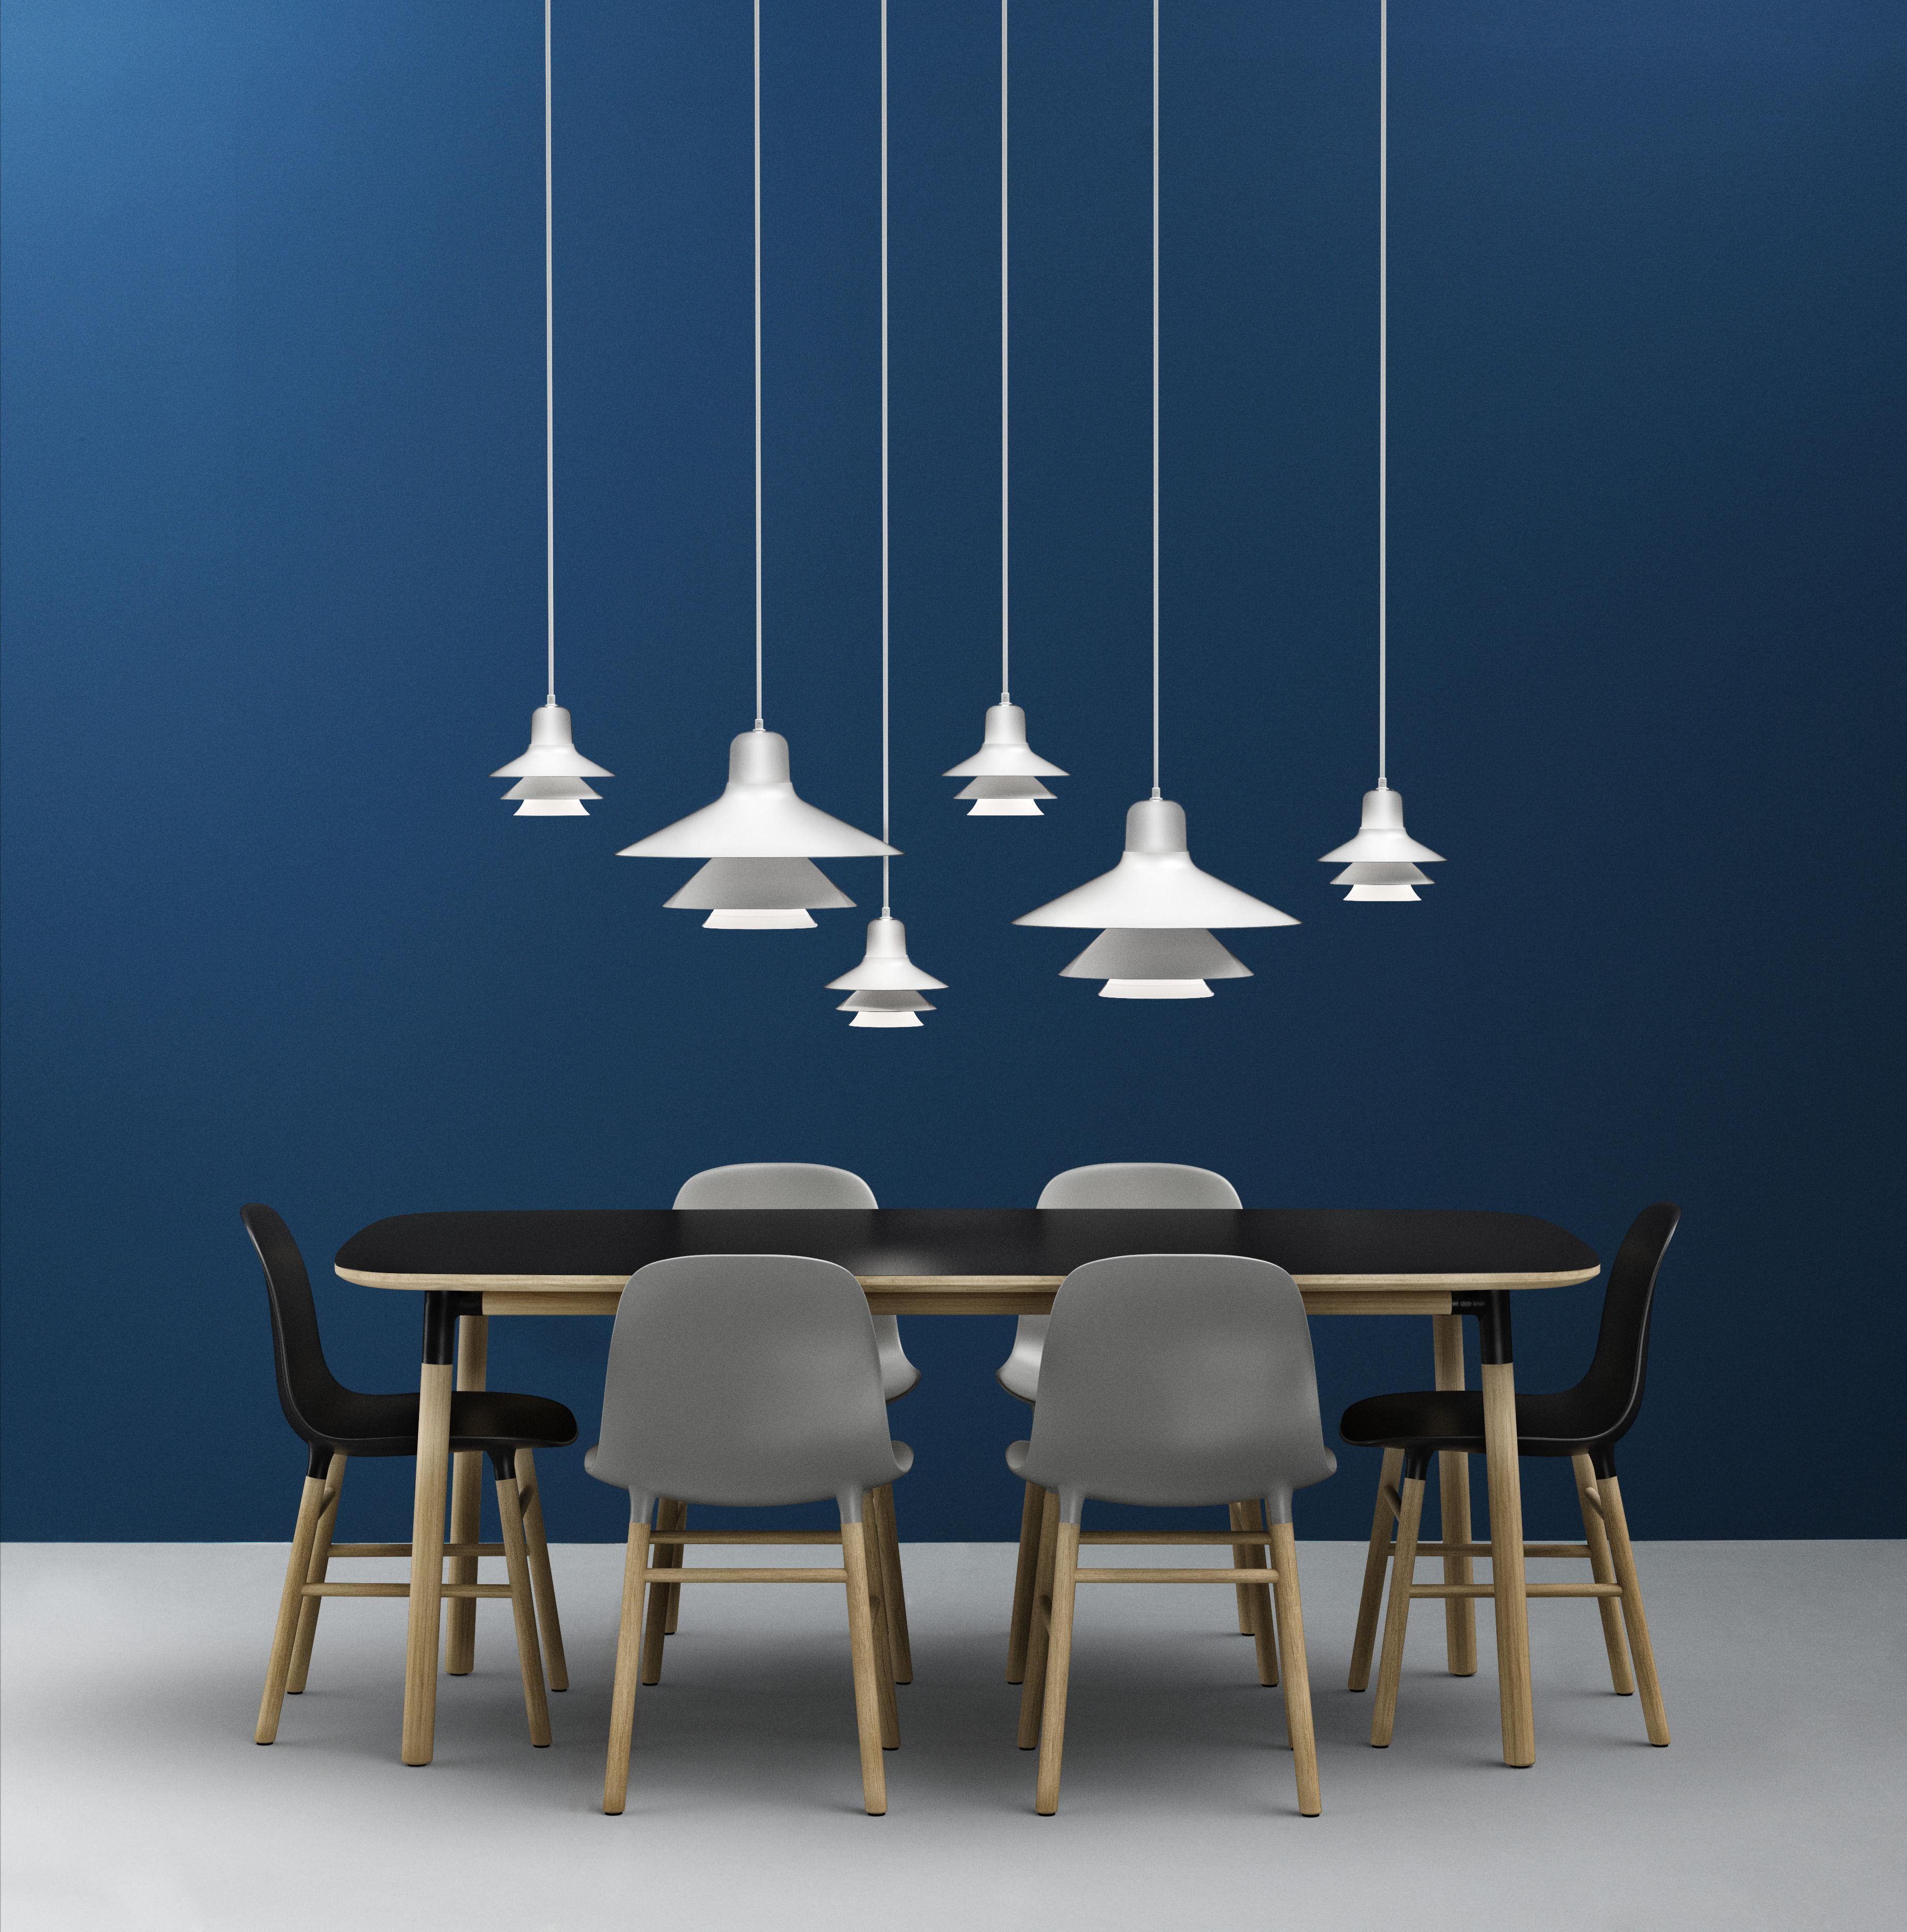 form chair walnut leg black walnut by normann copenhagen. Black Bedroom Furniture Sets. Home Design Ideas